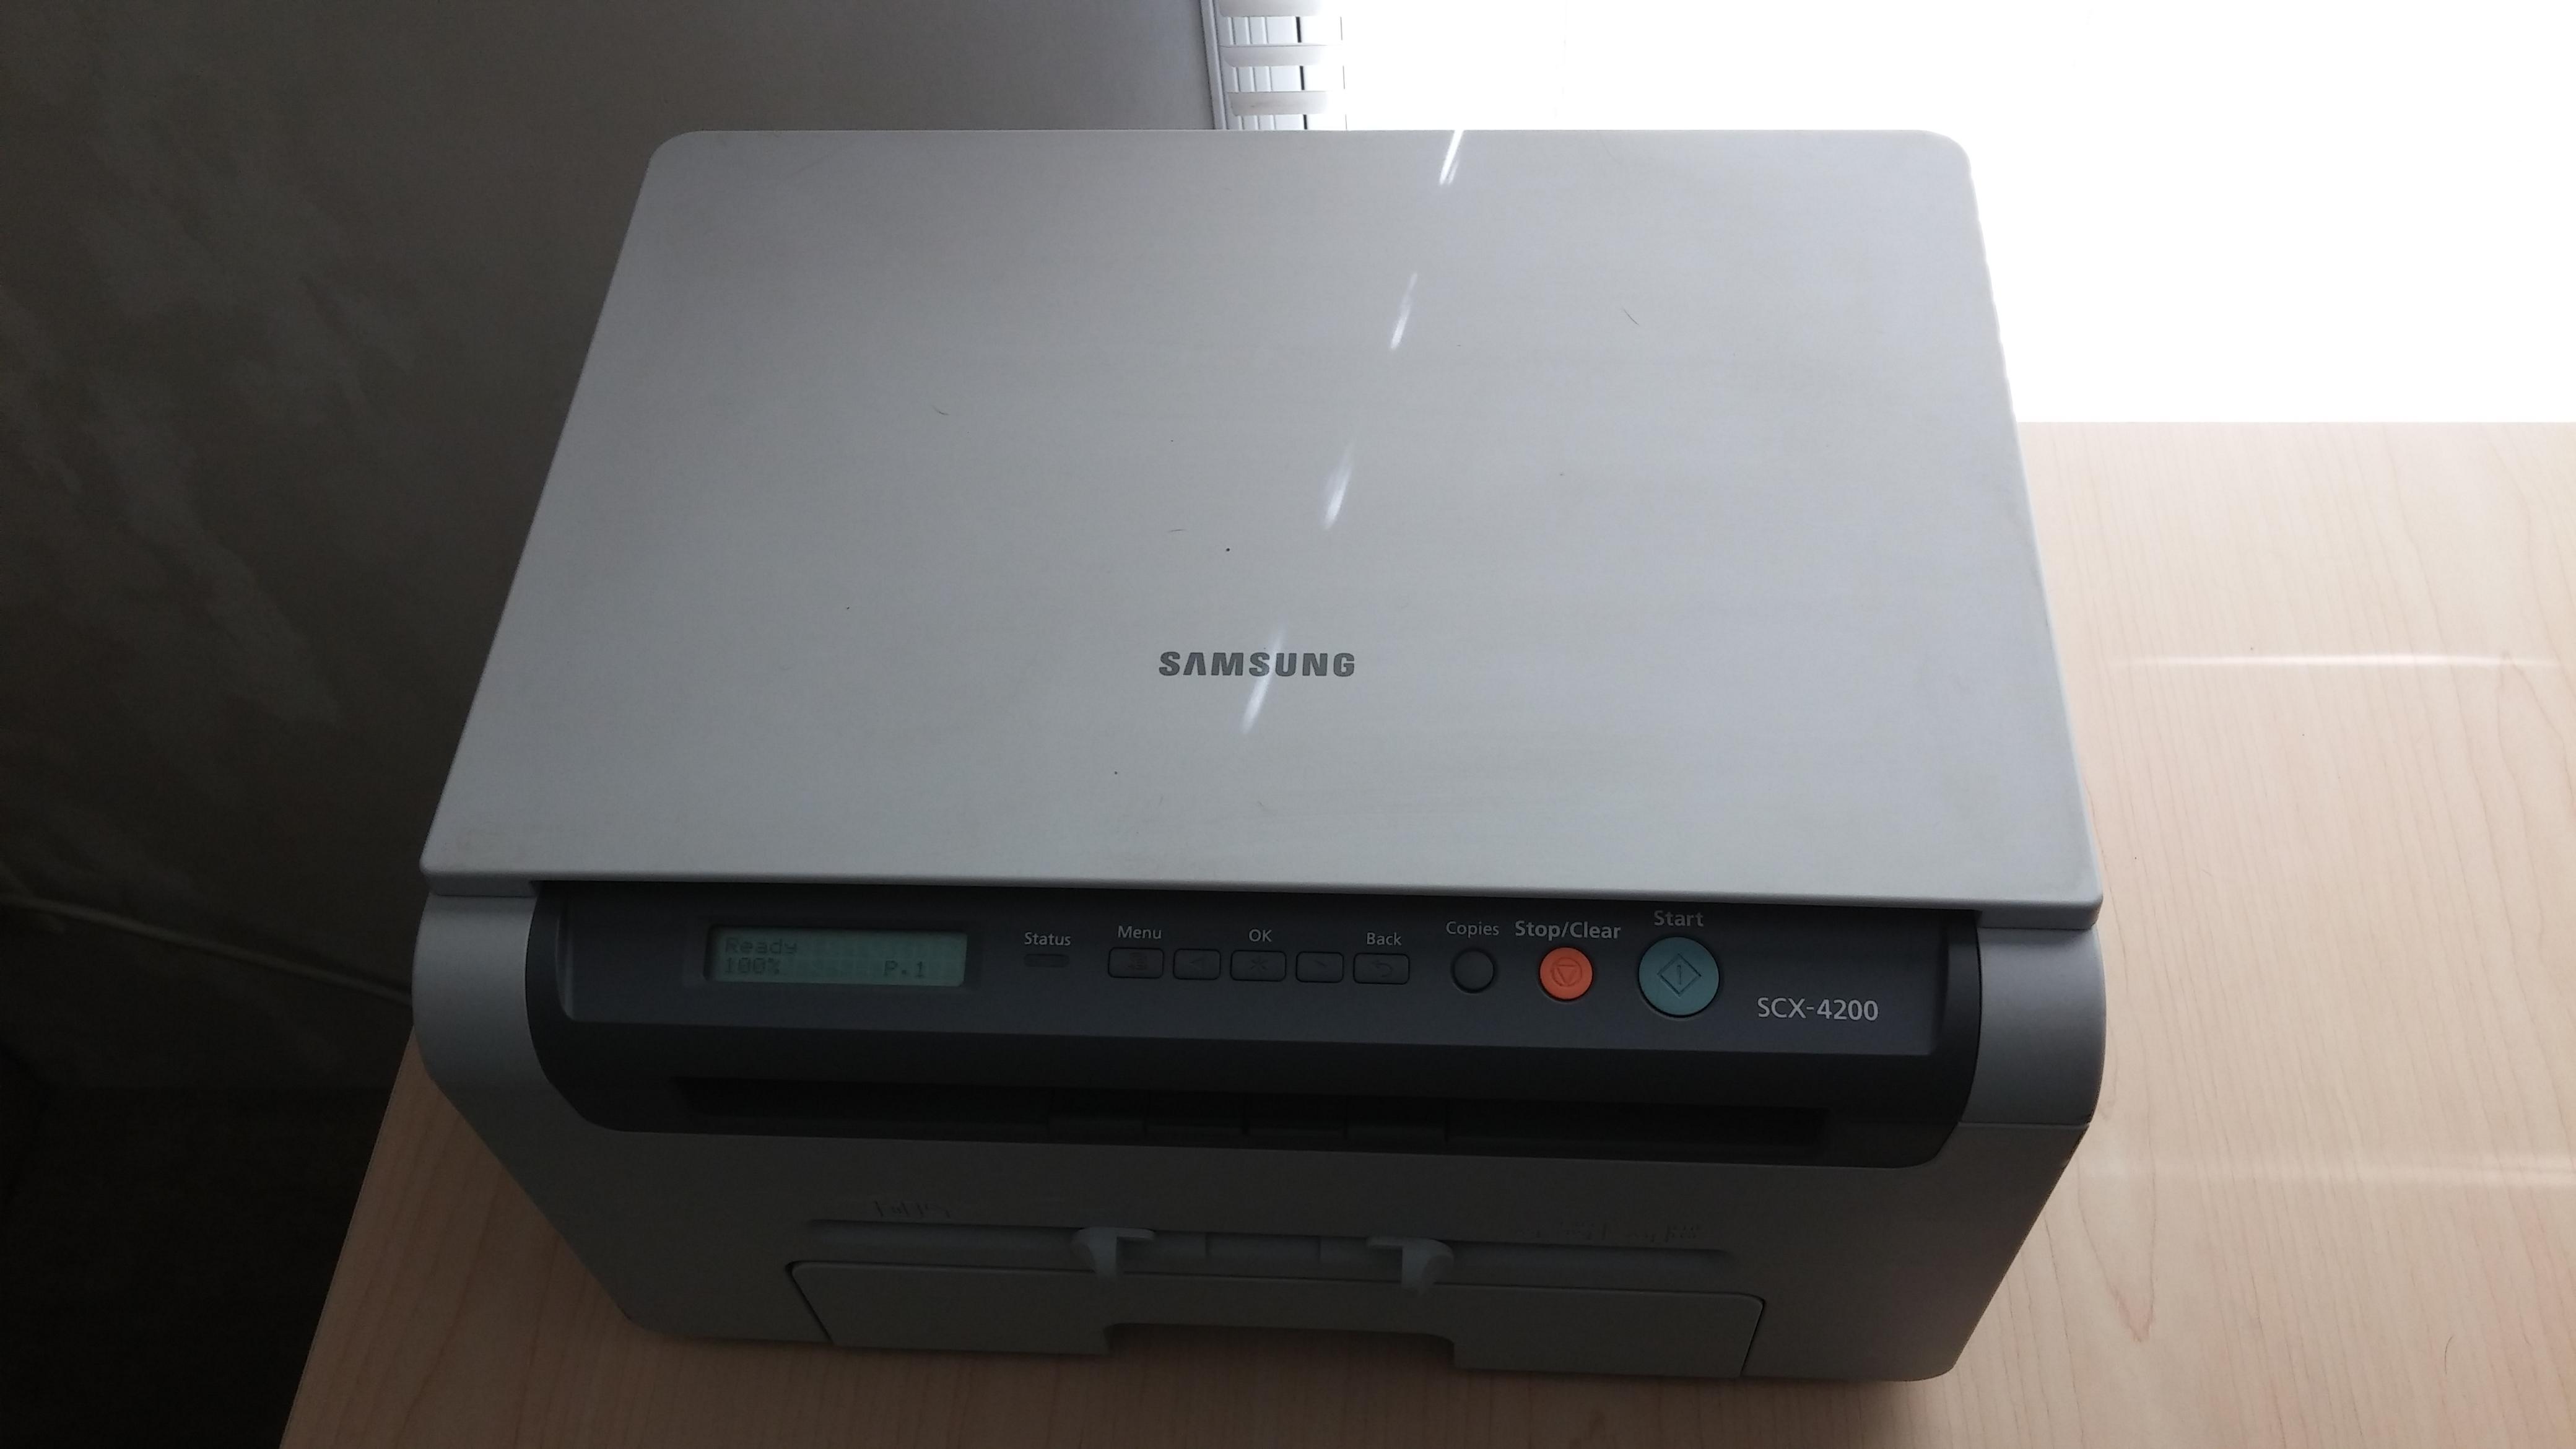 samsung printer copier scx 4200. Black Bedroom Furniture Sets. Home Design Ideas